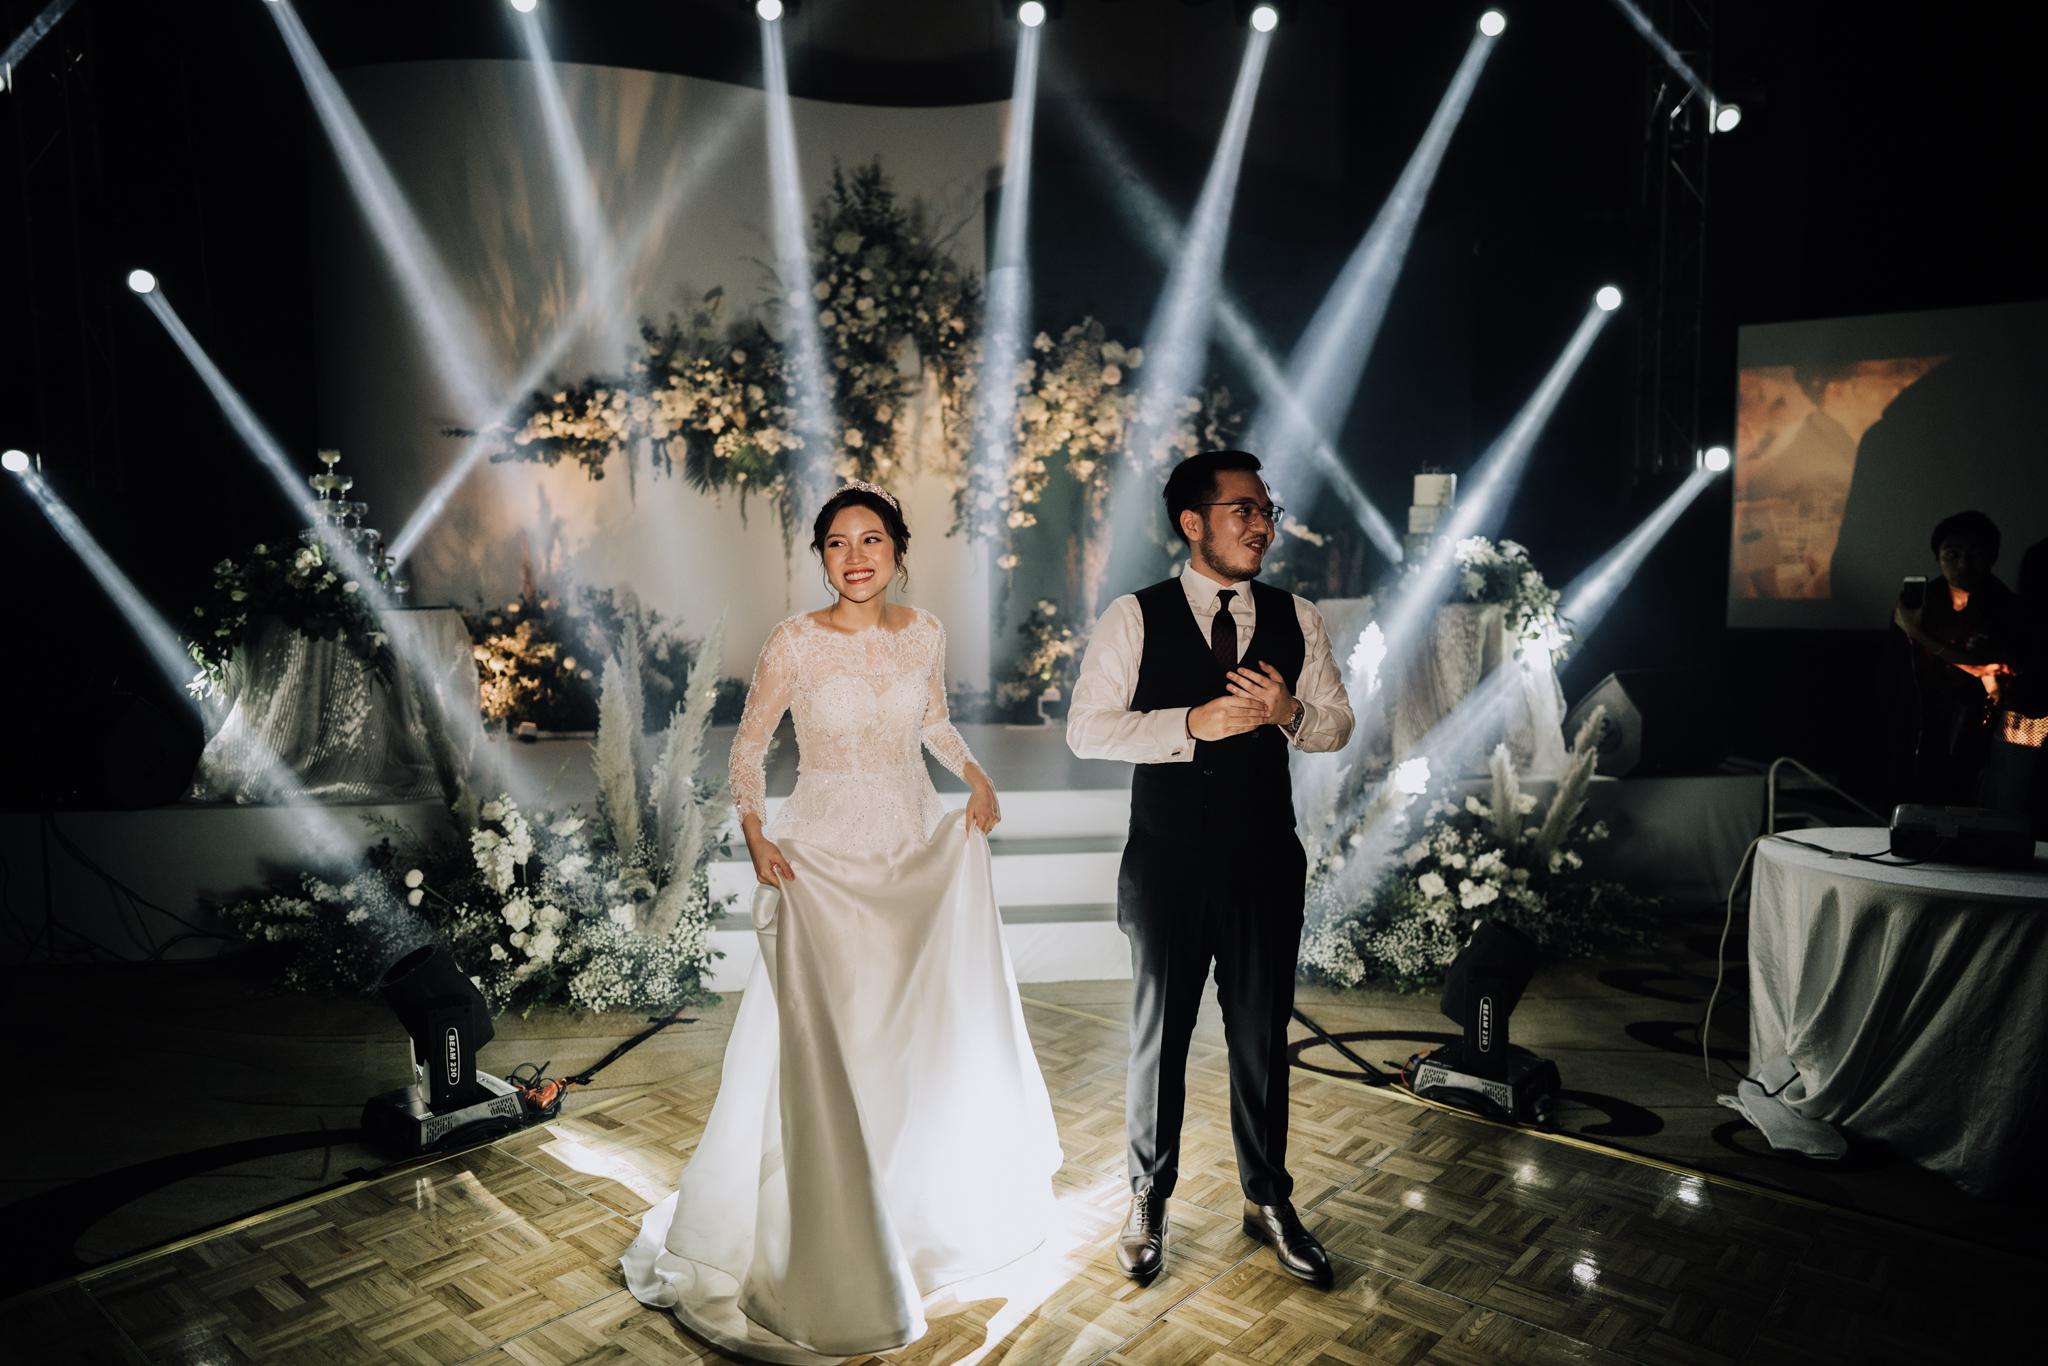 JWMarriott Ha Noi Intimate Wedding of Trang Hi well captured by Hipster Wedding Vietnam Wedding Photographer-36459.jpg